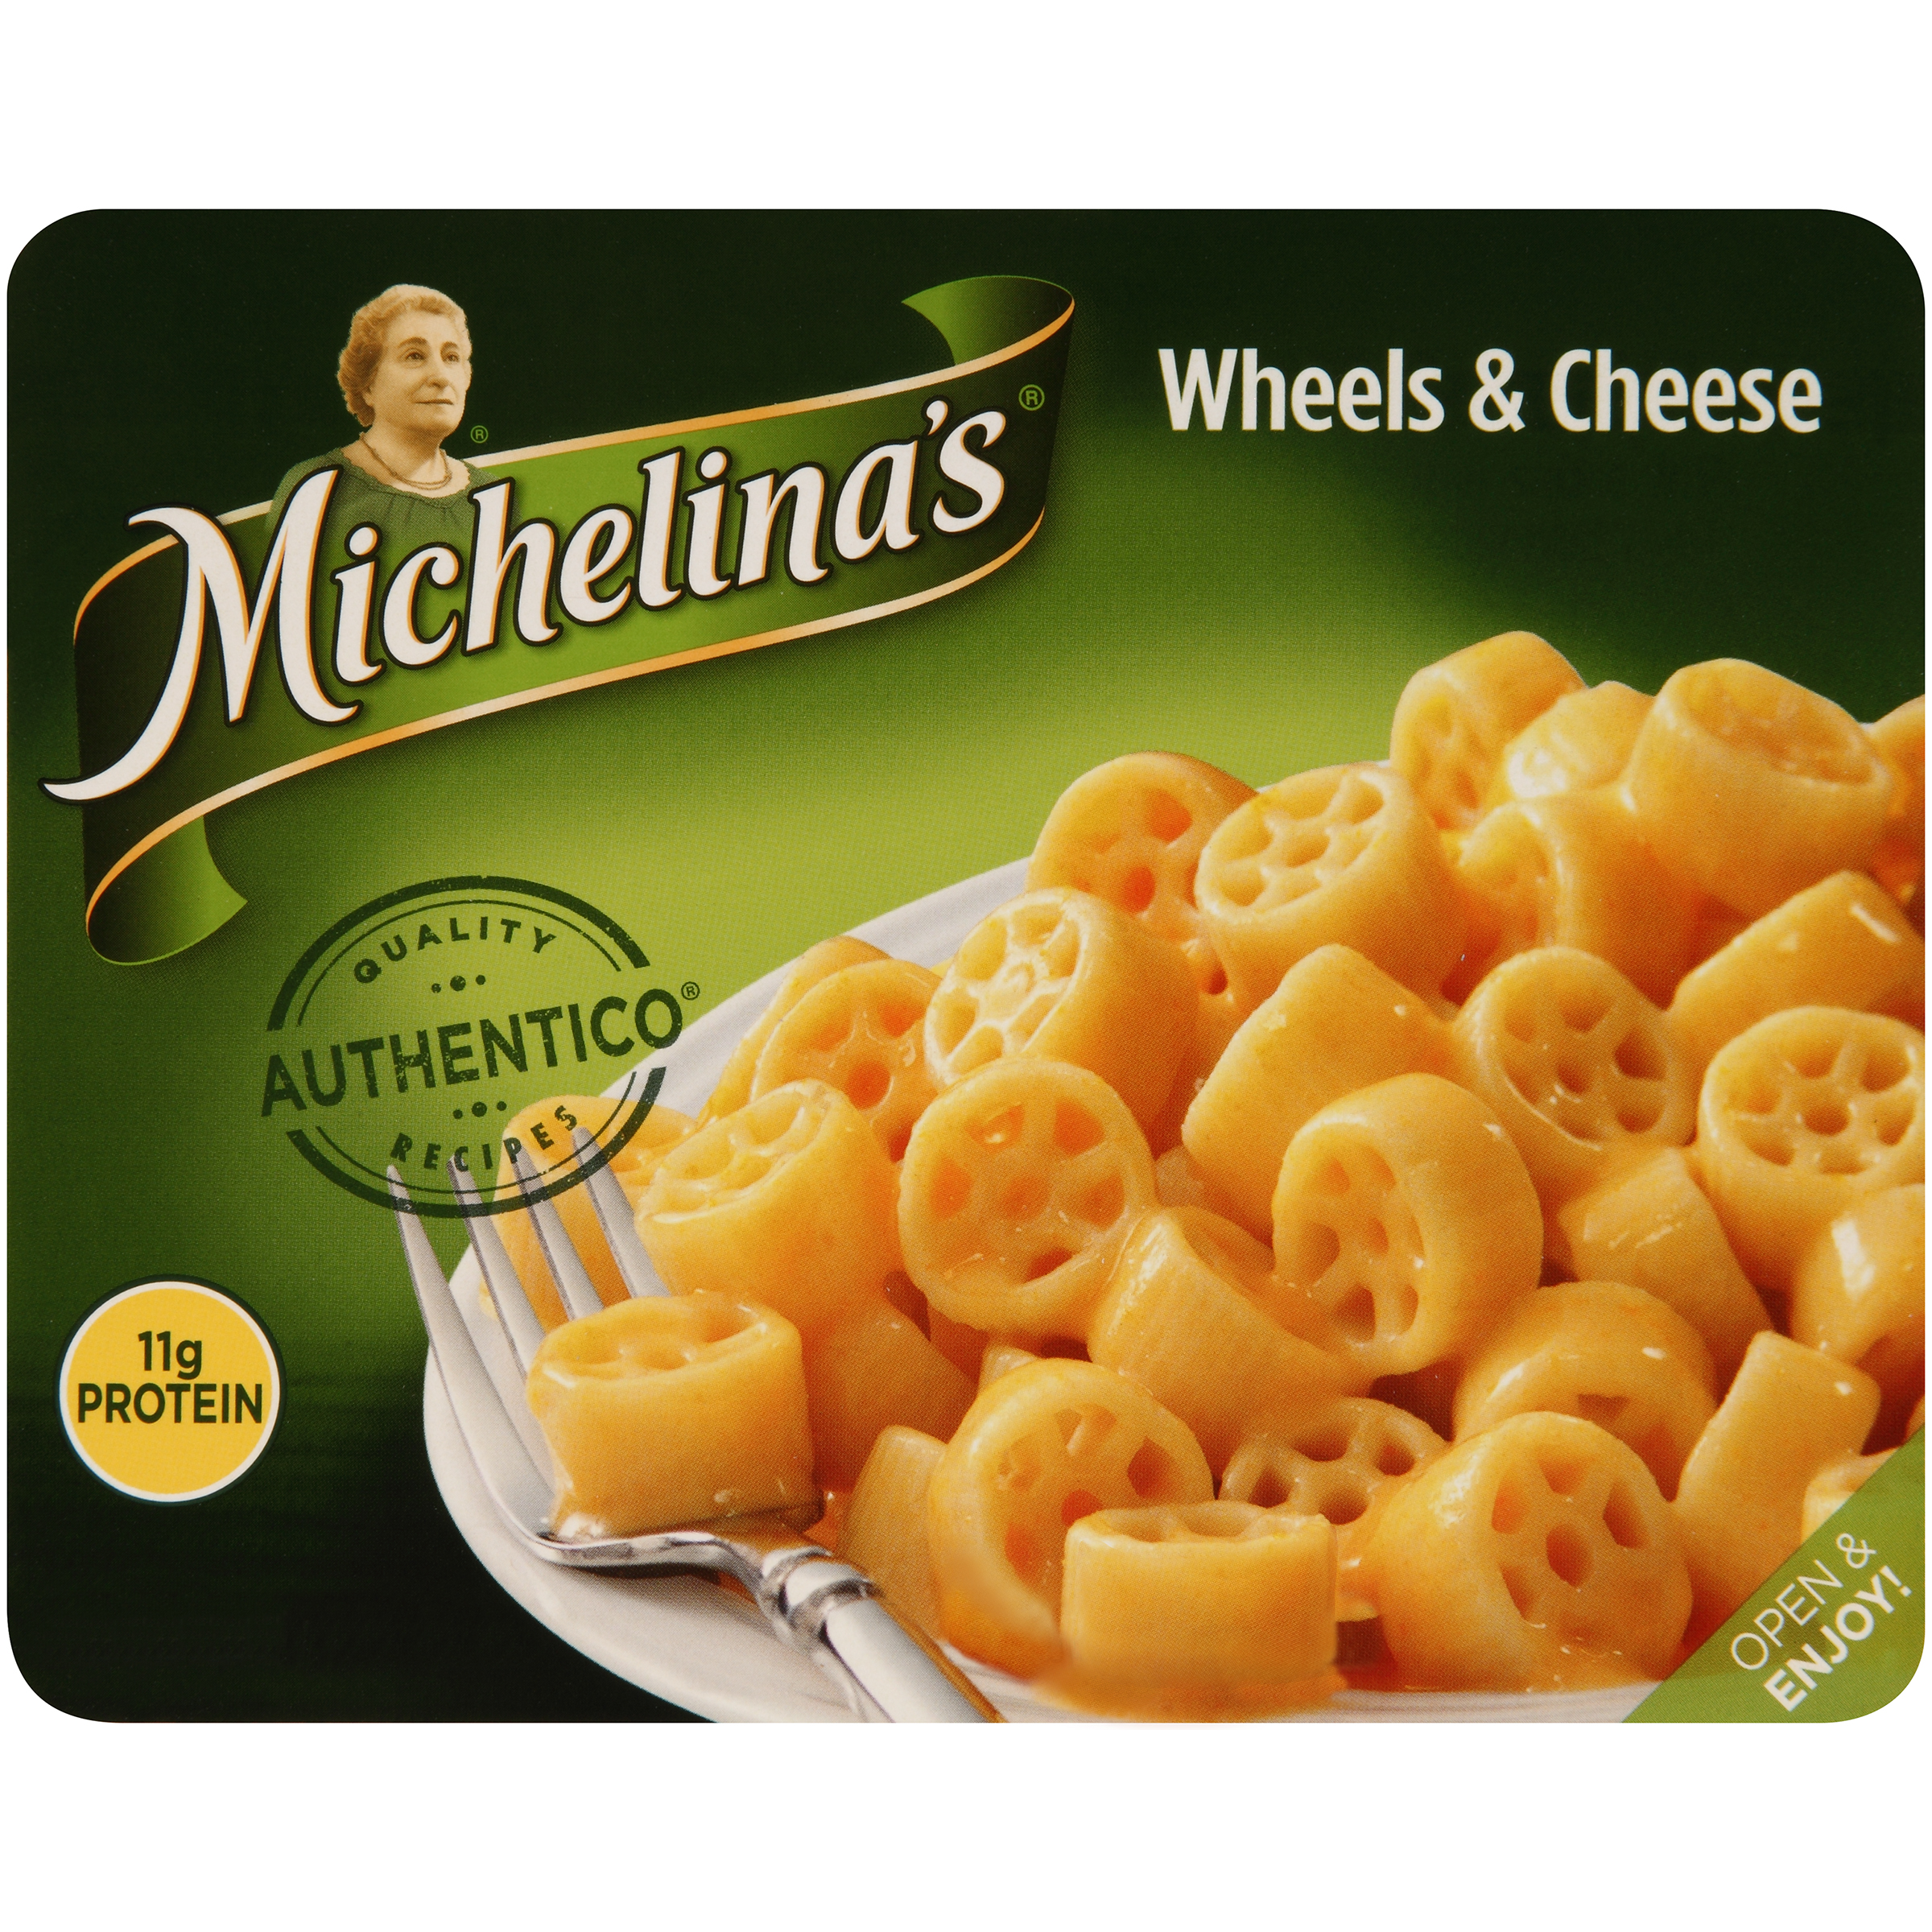 Michelina's�� Authentico�� Wheels & Cheese 8 oz. Tray